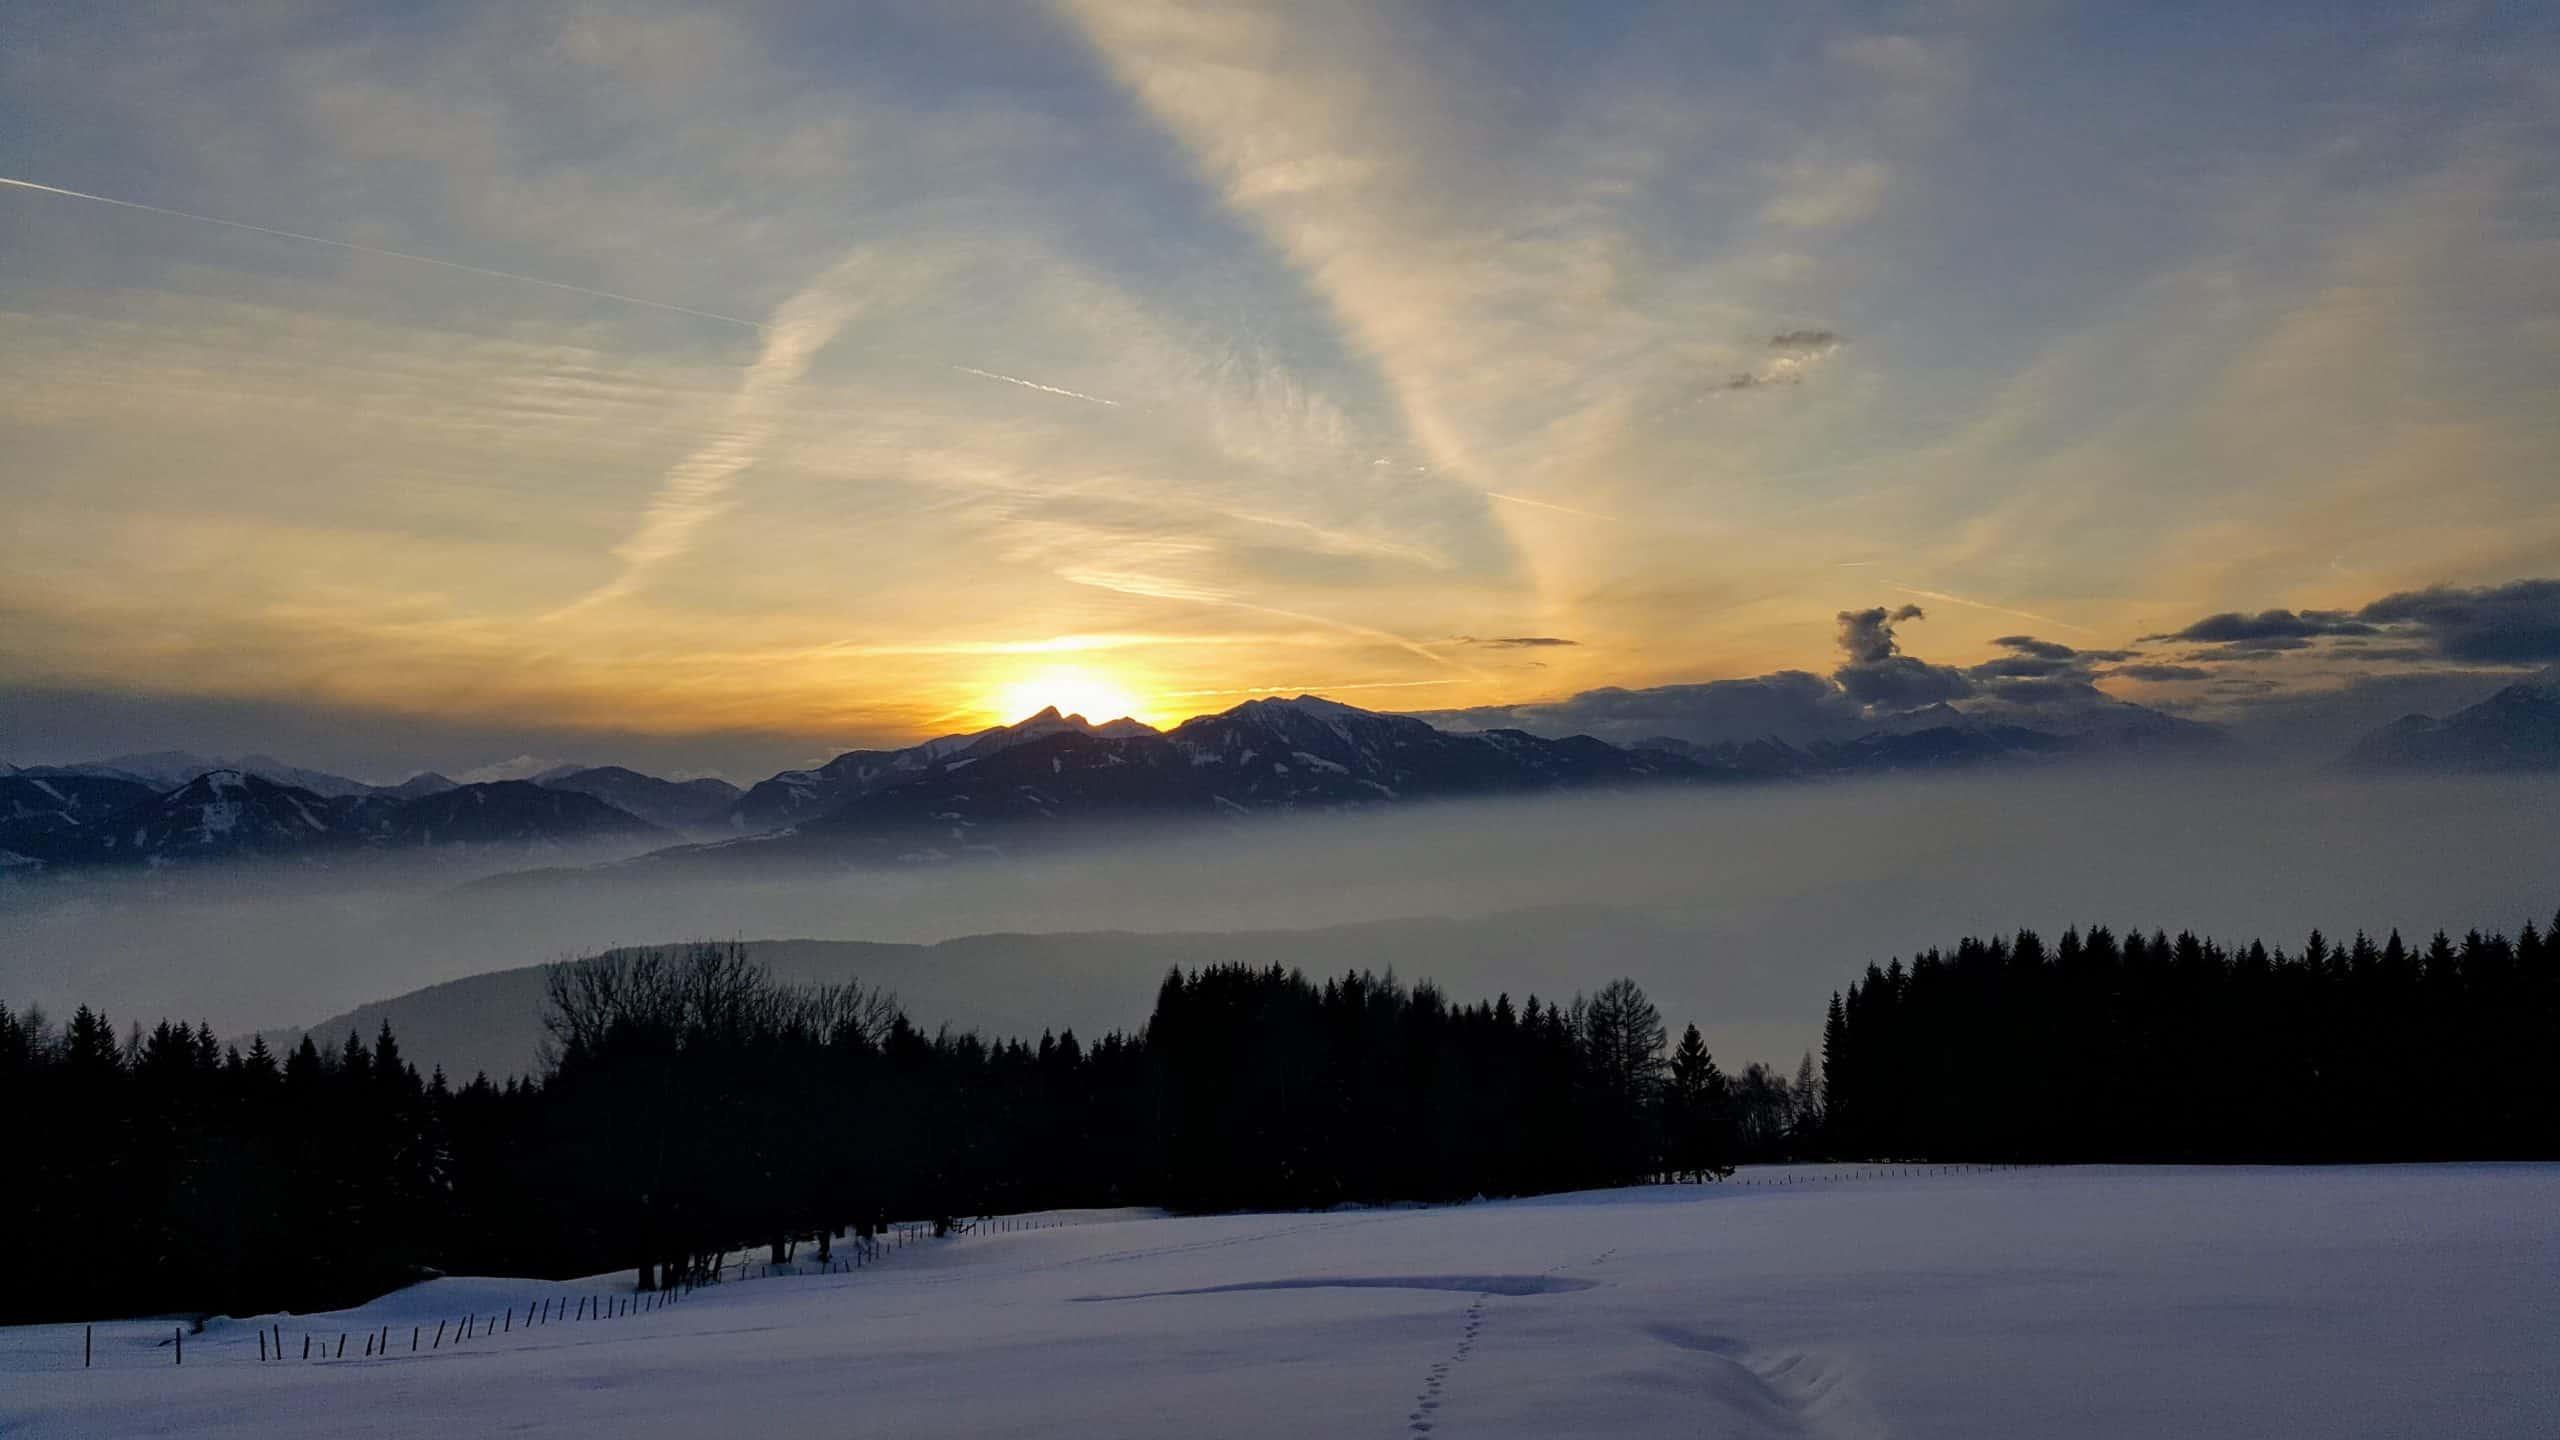 Winterlandschaft Nockberge Urlaubsregion Millstätter See in Kärnten - Sonnenuntergang